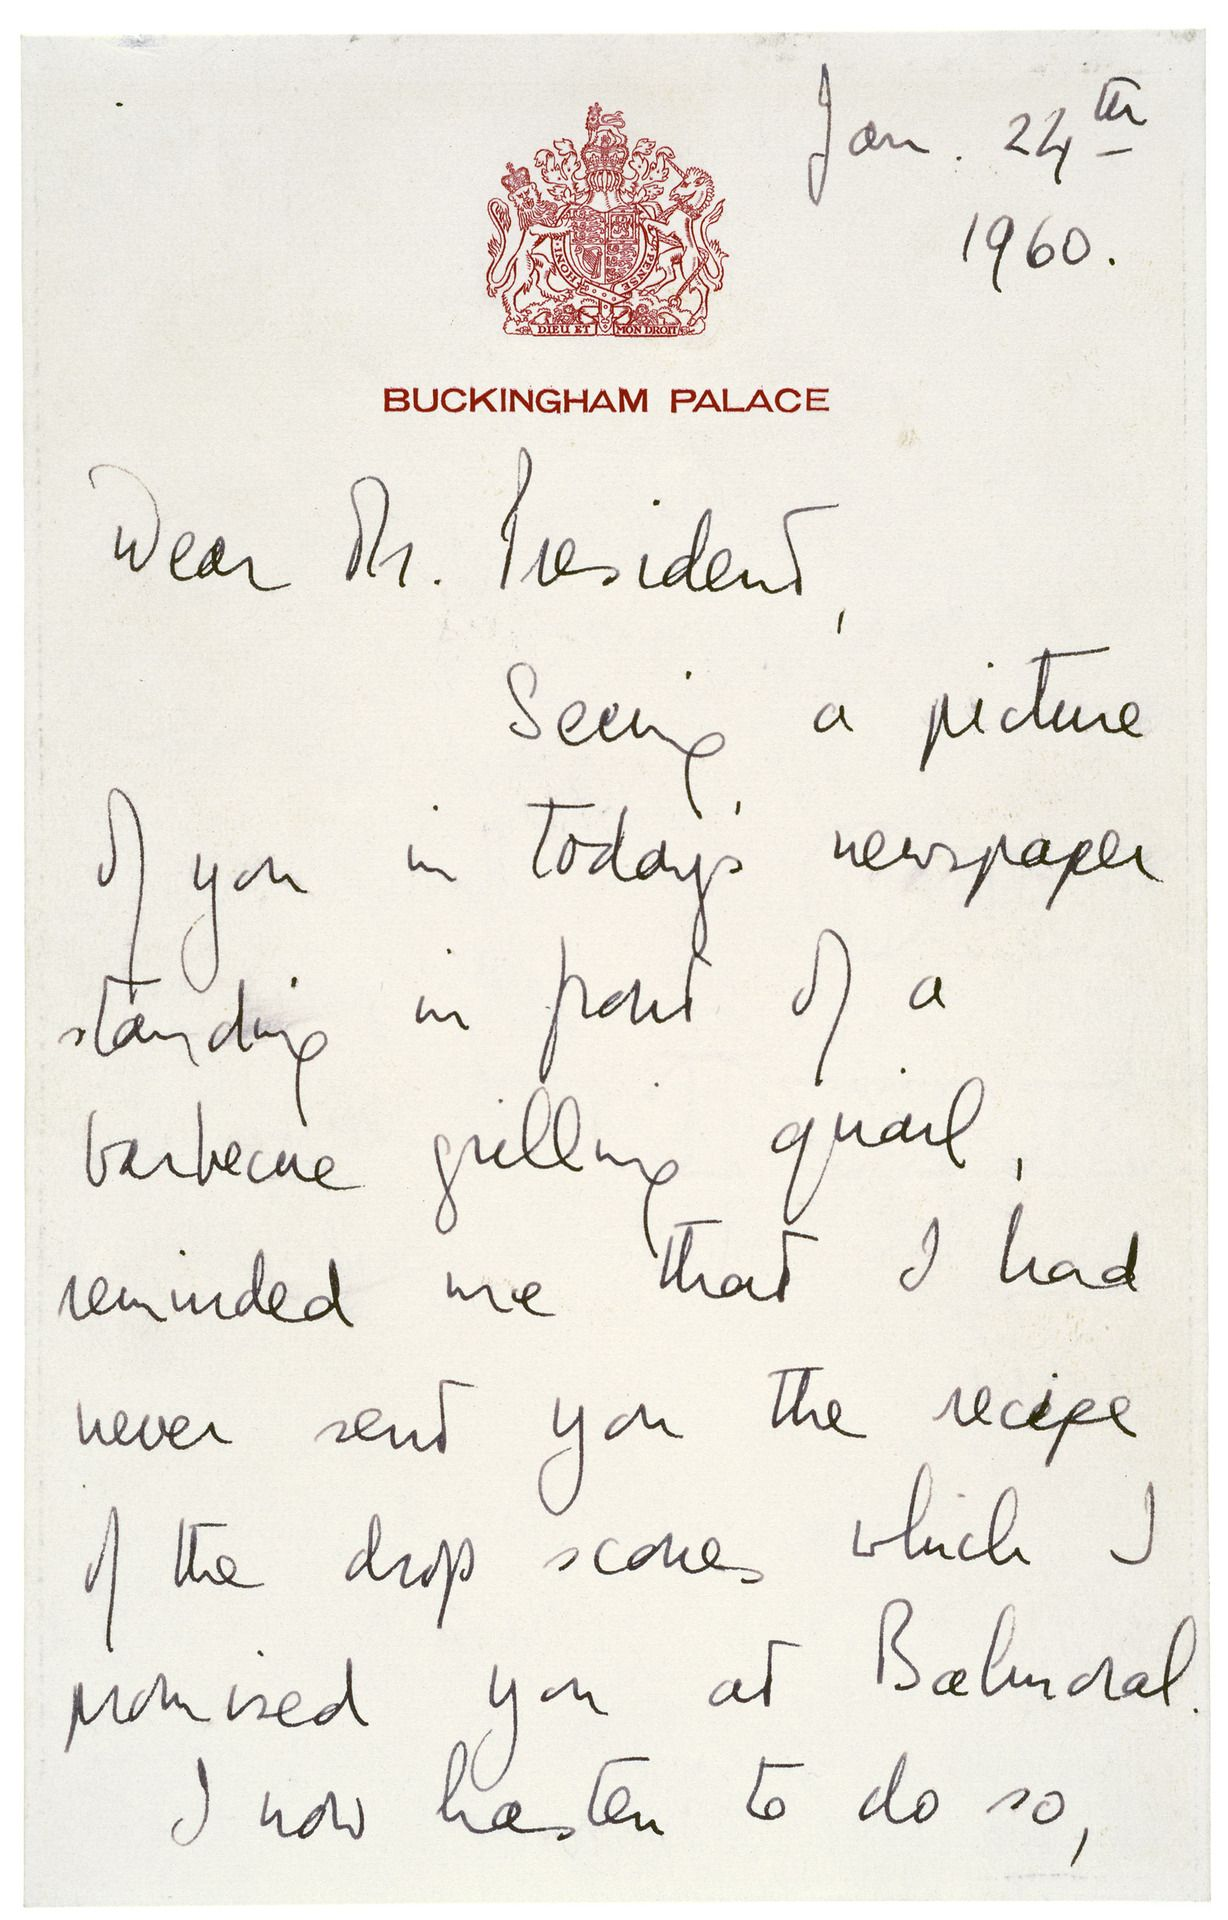 Queen Elizabeth S Letter To President Dwight D Eisenhower